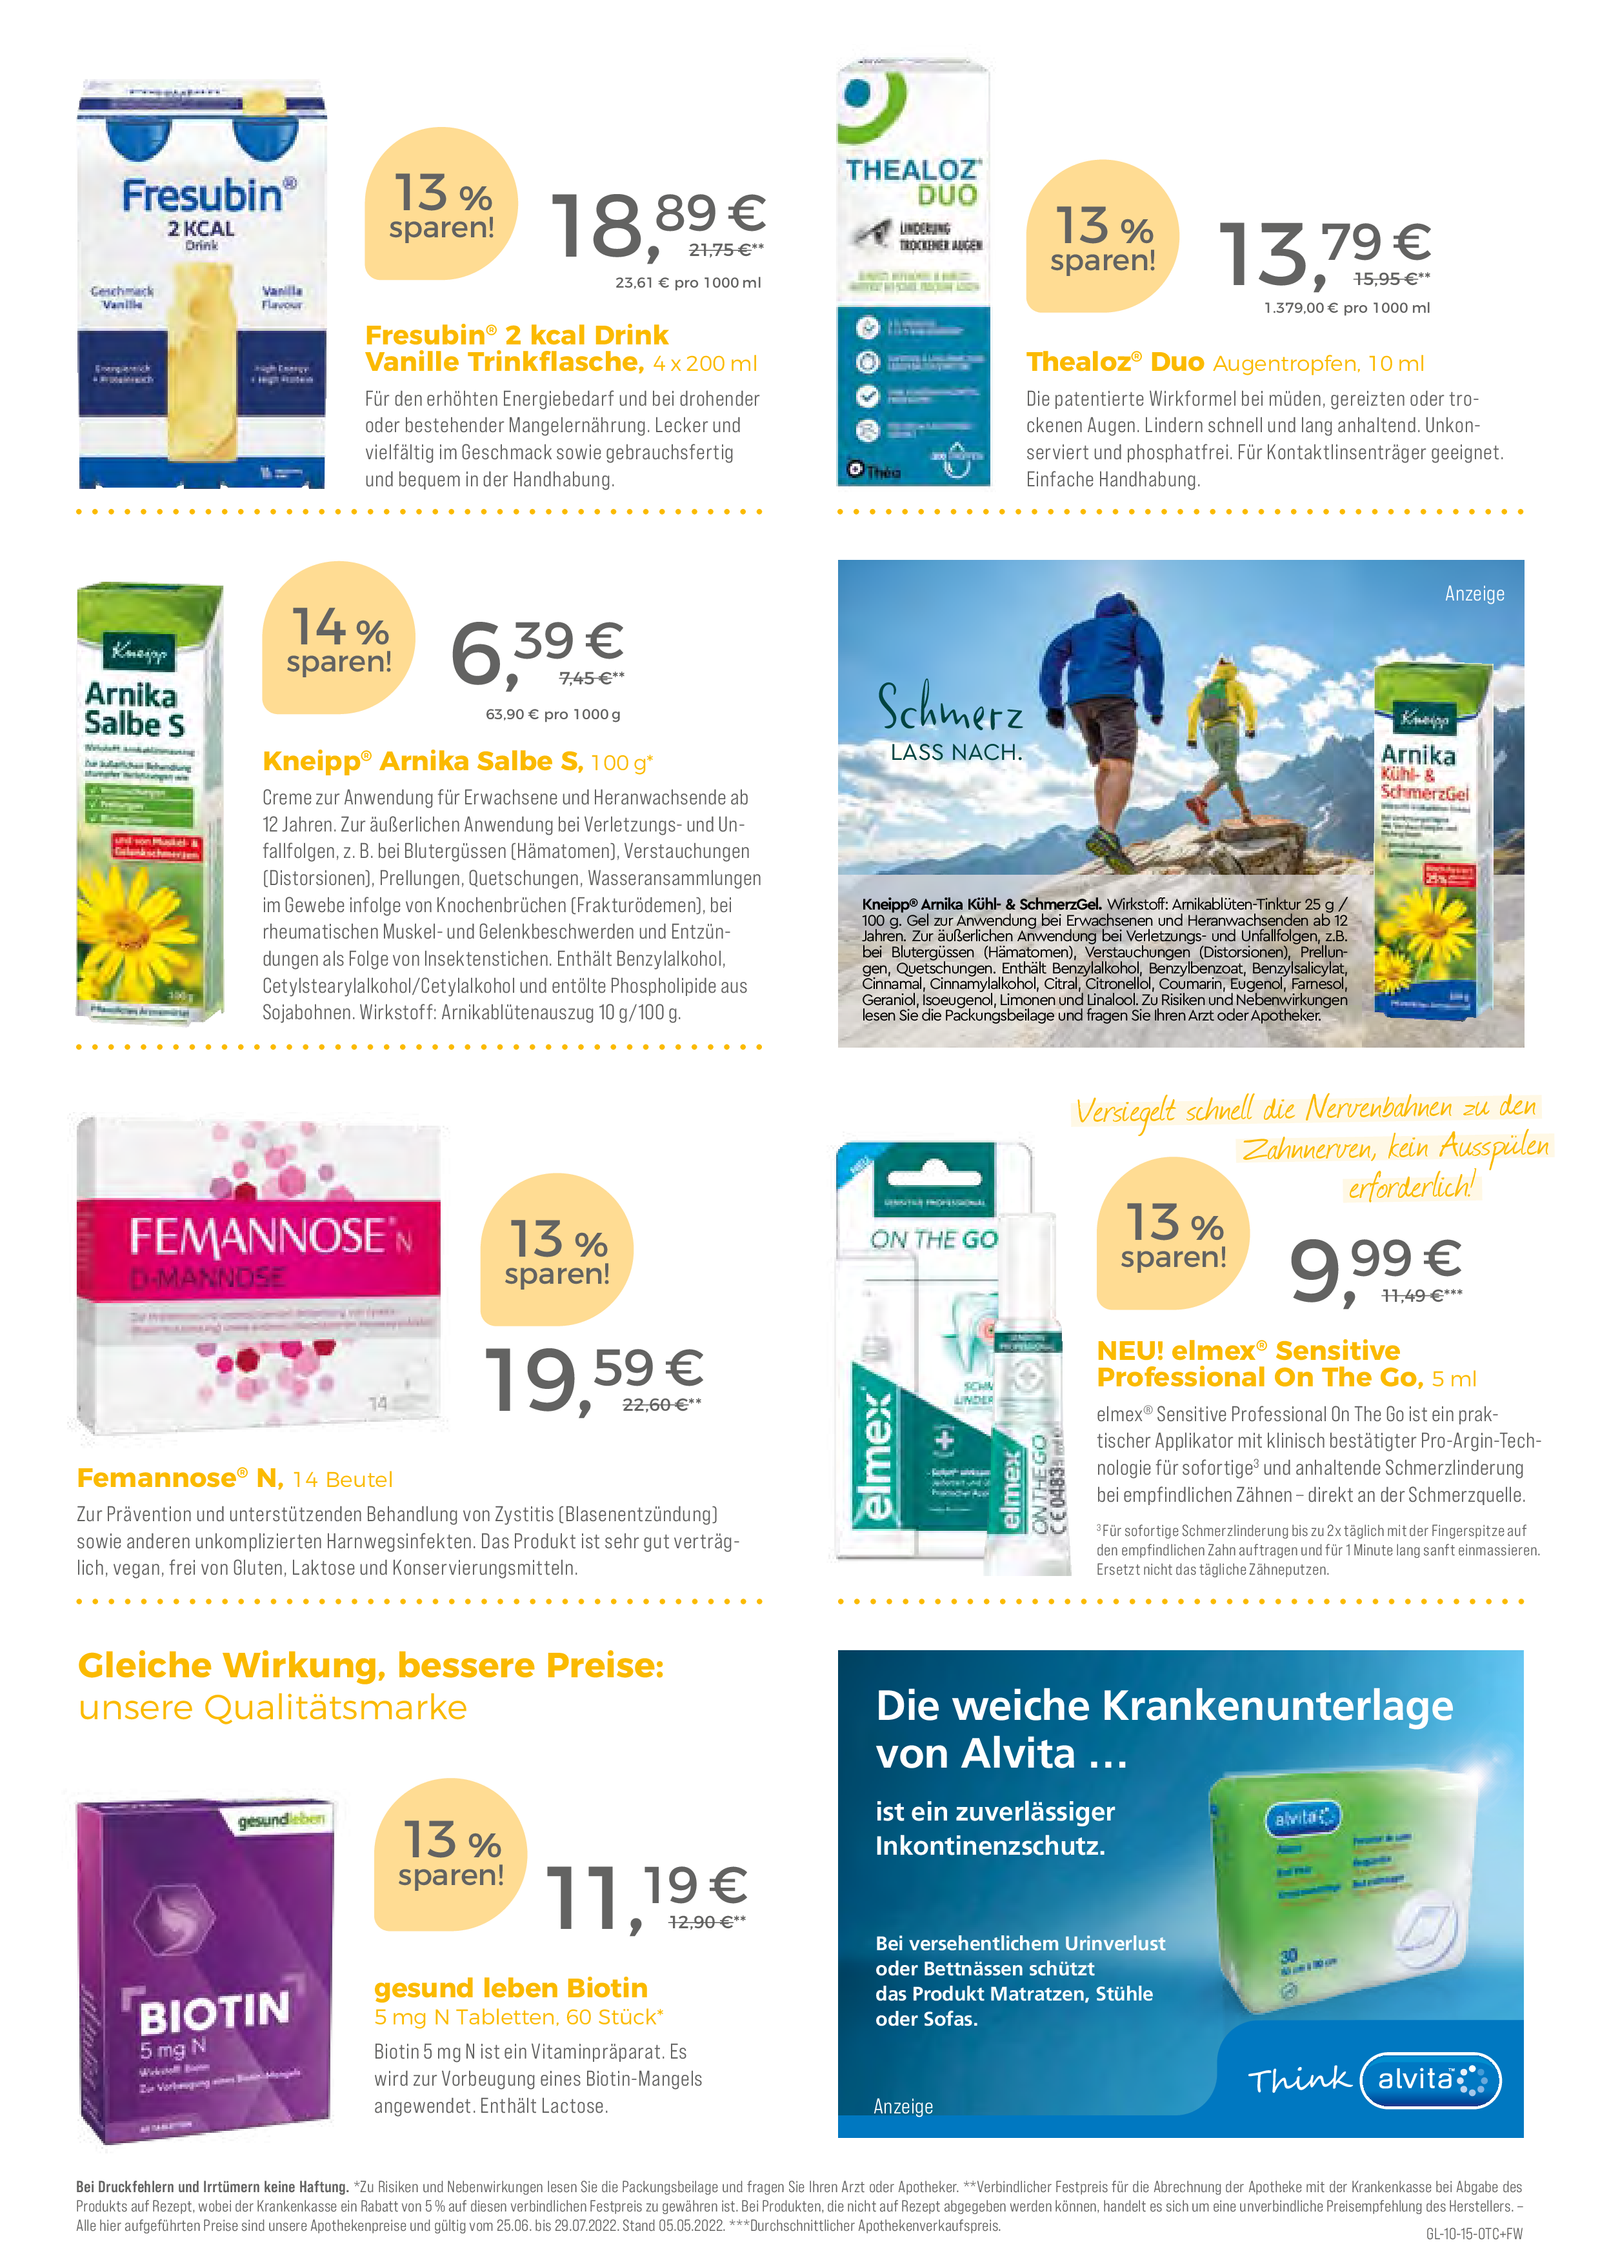 https://mein-uploads.apocdn.net/14700/leaflets/gesundleben_niedrig-Seite3.png